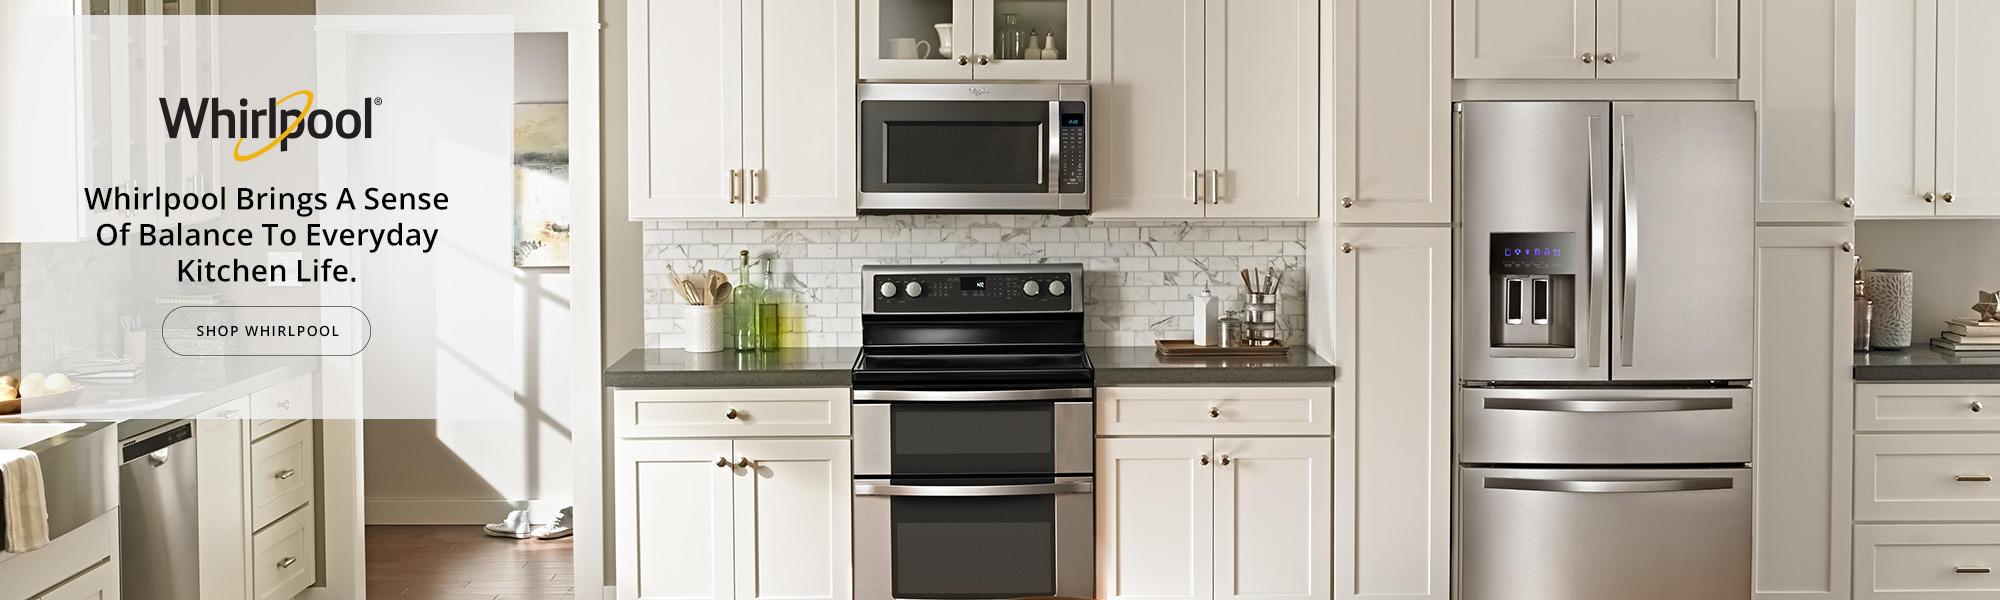 Tony's Appliance, Inc. image 2